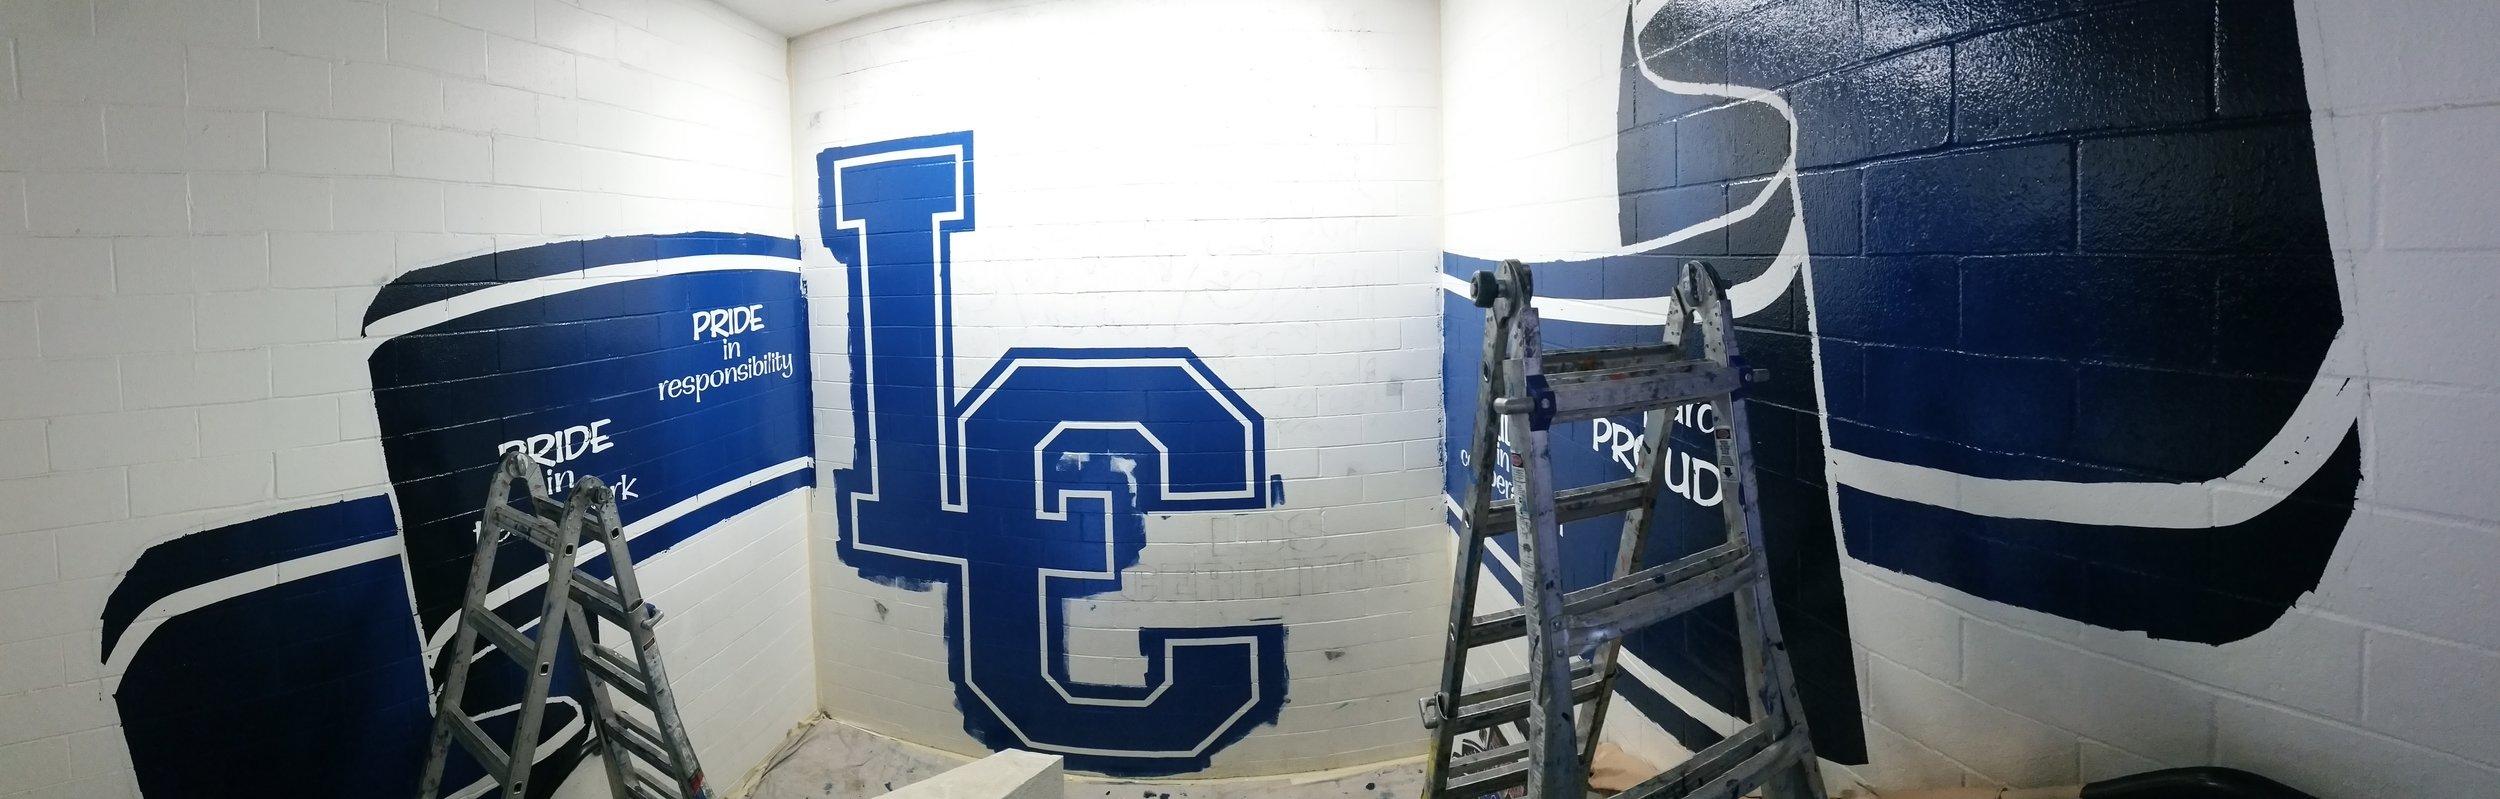 HAND PAINTED SCHOOL MASCOT MURAL - painted work in progress